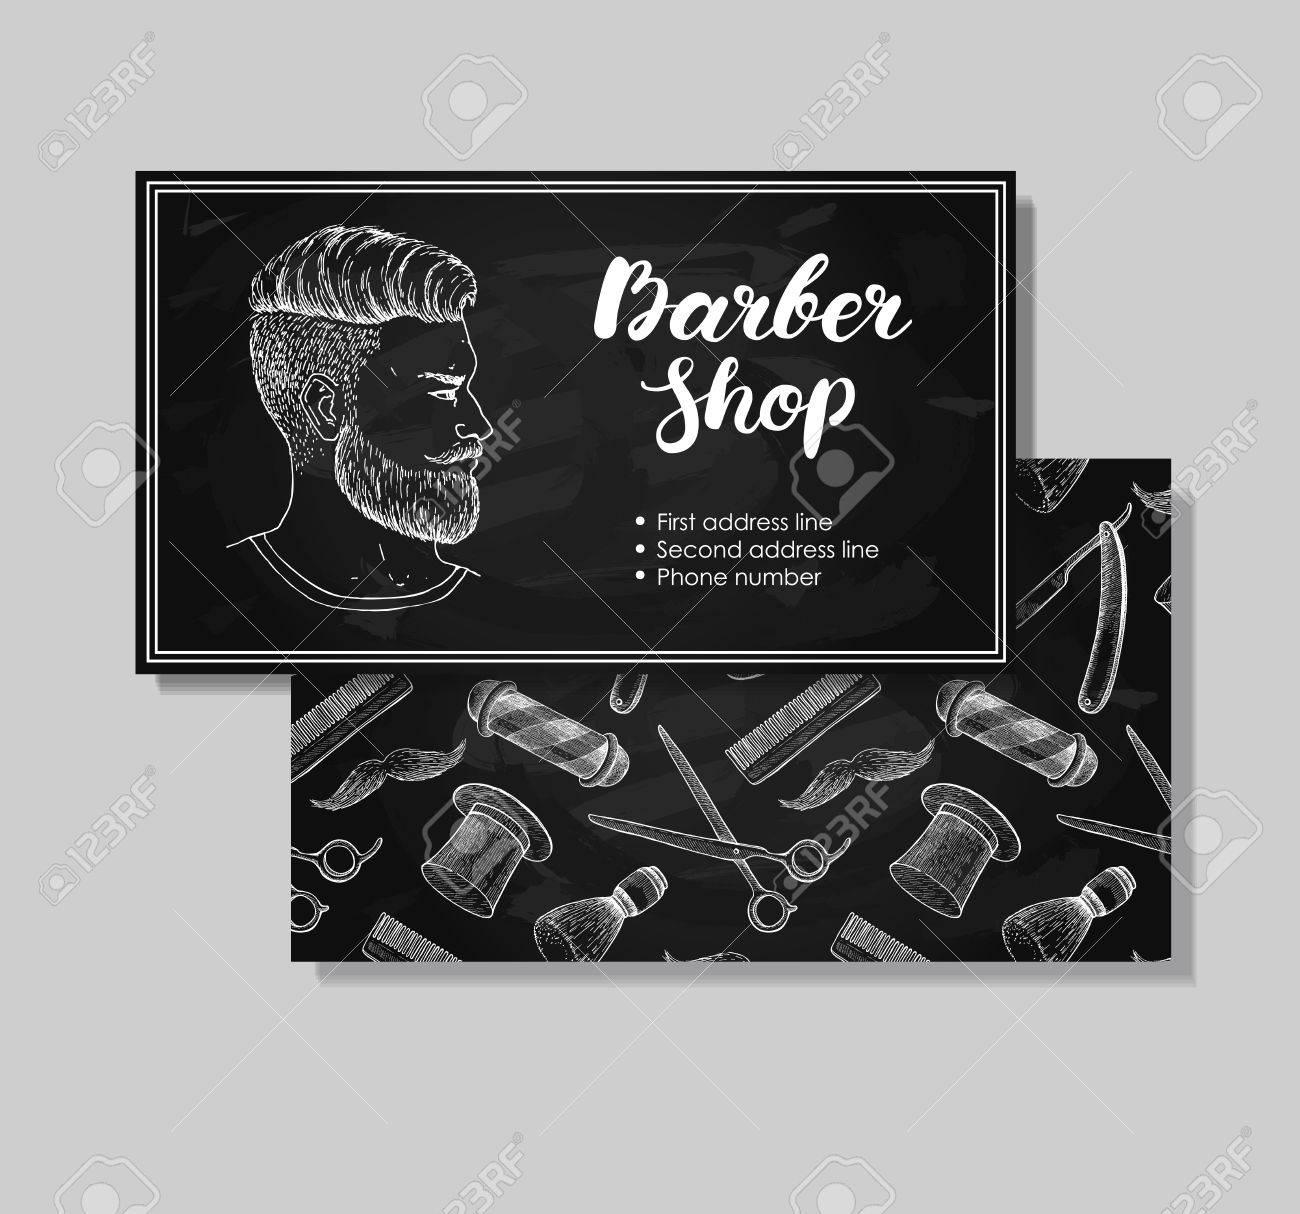 Vector Vintage Hand Drawn Barber Shop Business Cards. Detailed ...